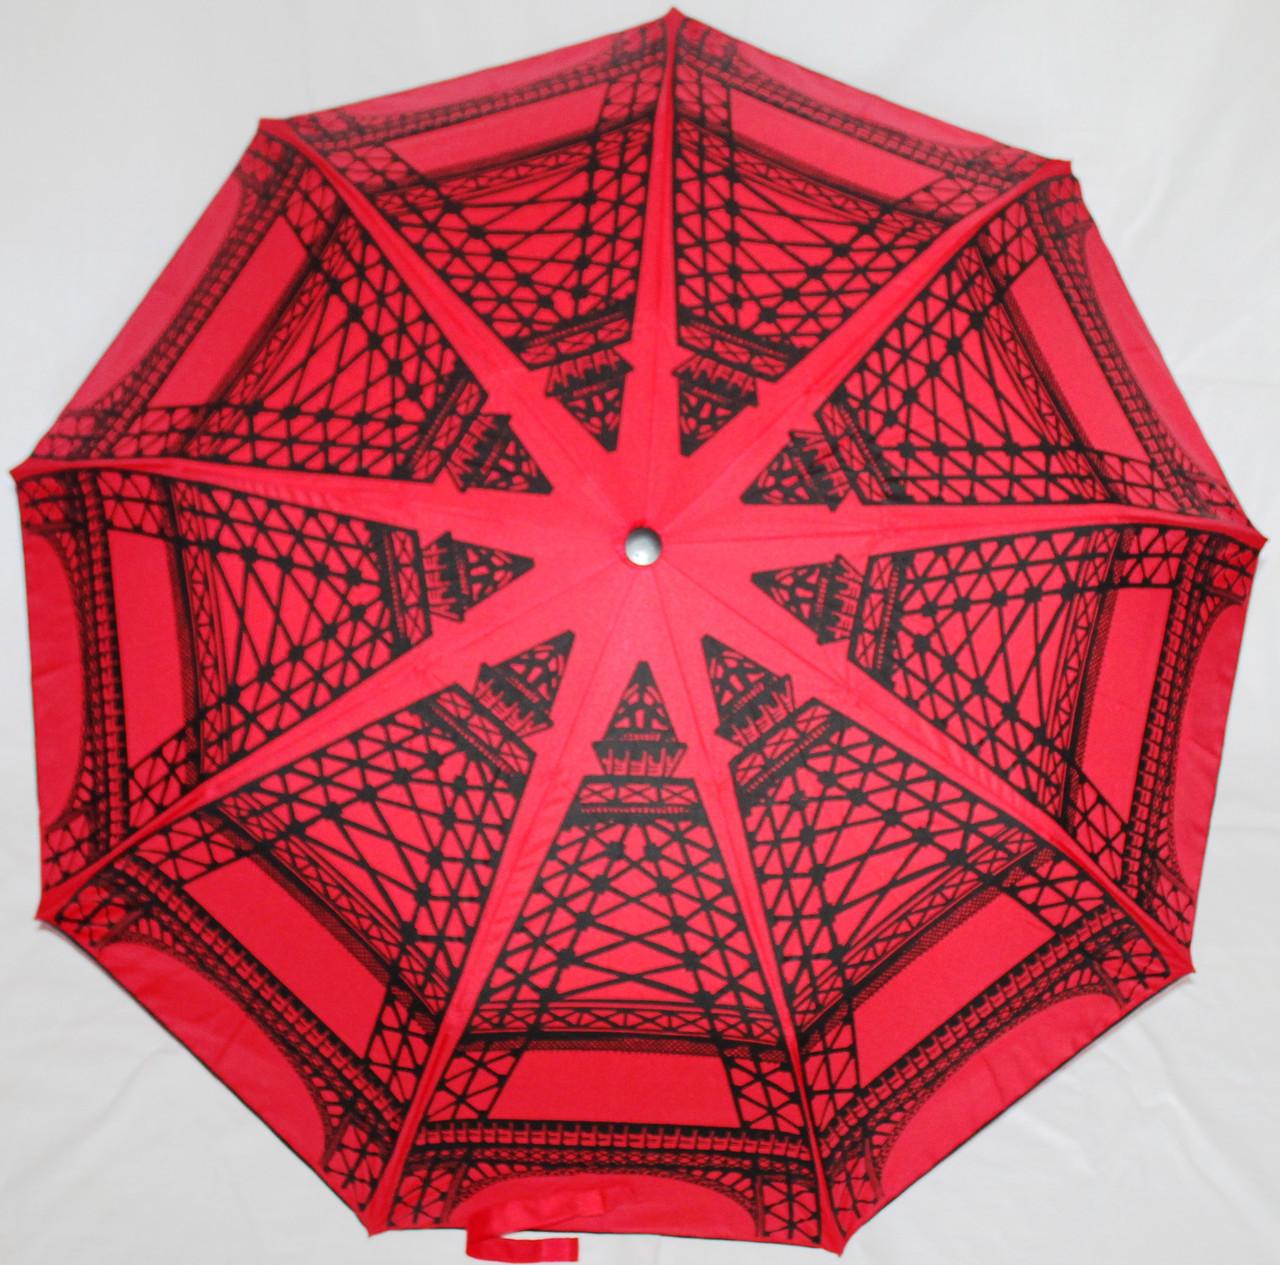 Зонт женский SR 707 0377 антиветер полуавтомат